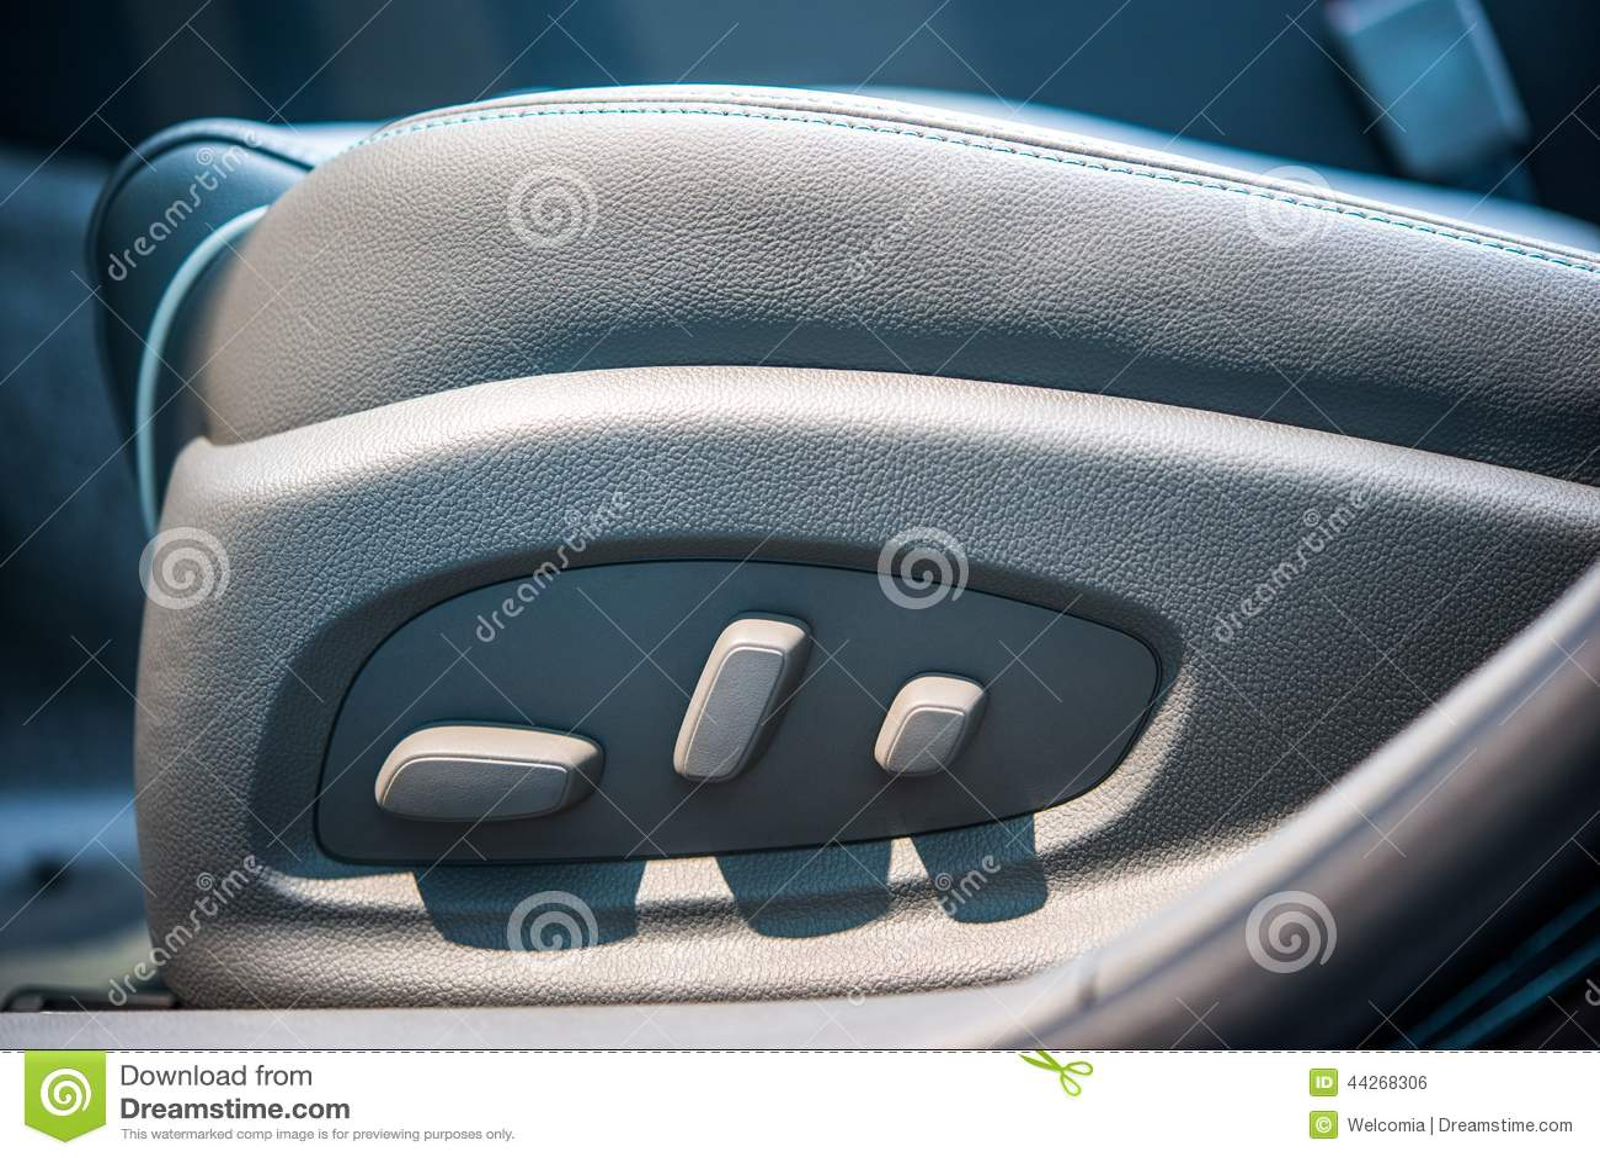 car seat adjustment royalty free stock photography. Black Bedroom Furniture Sets. Home Design Ideas